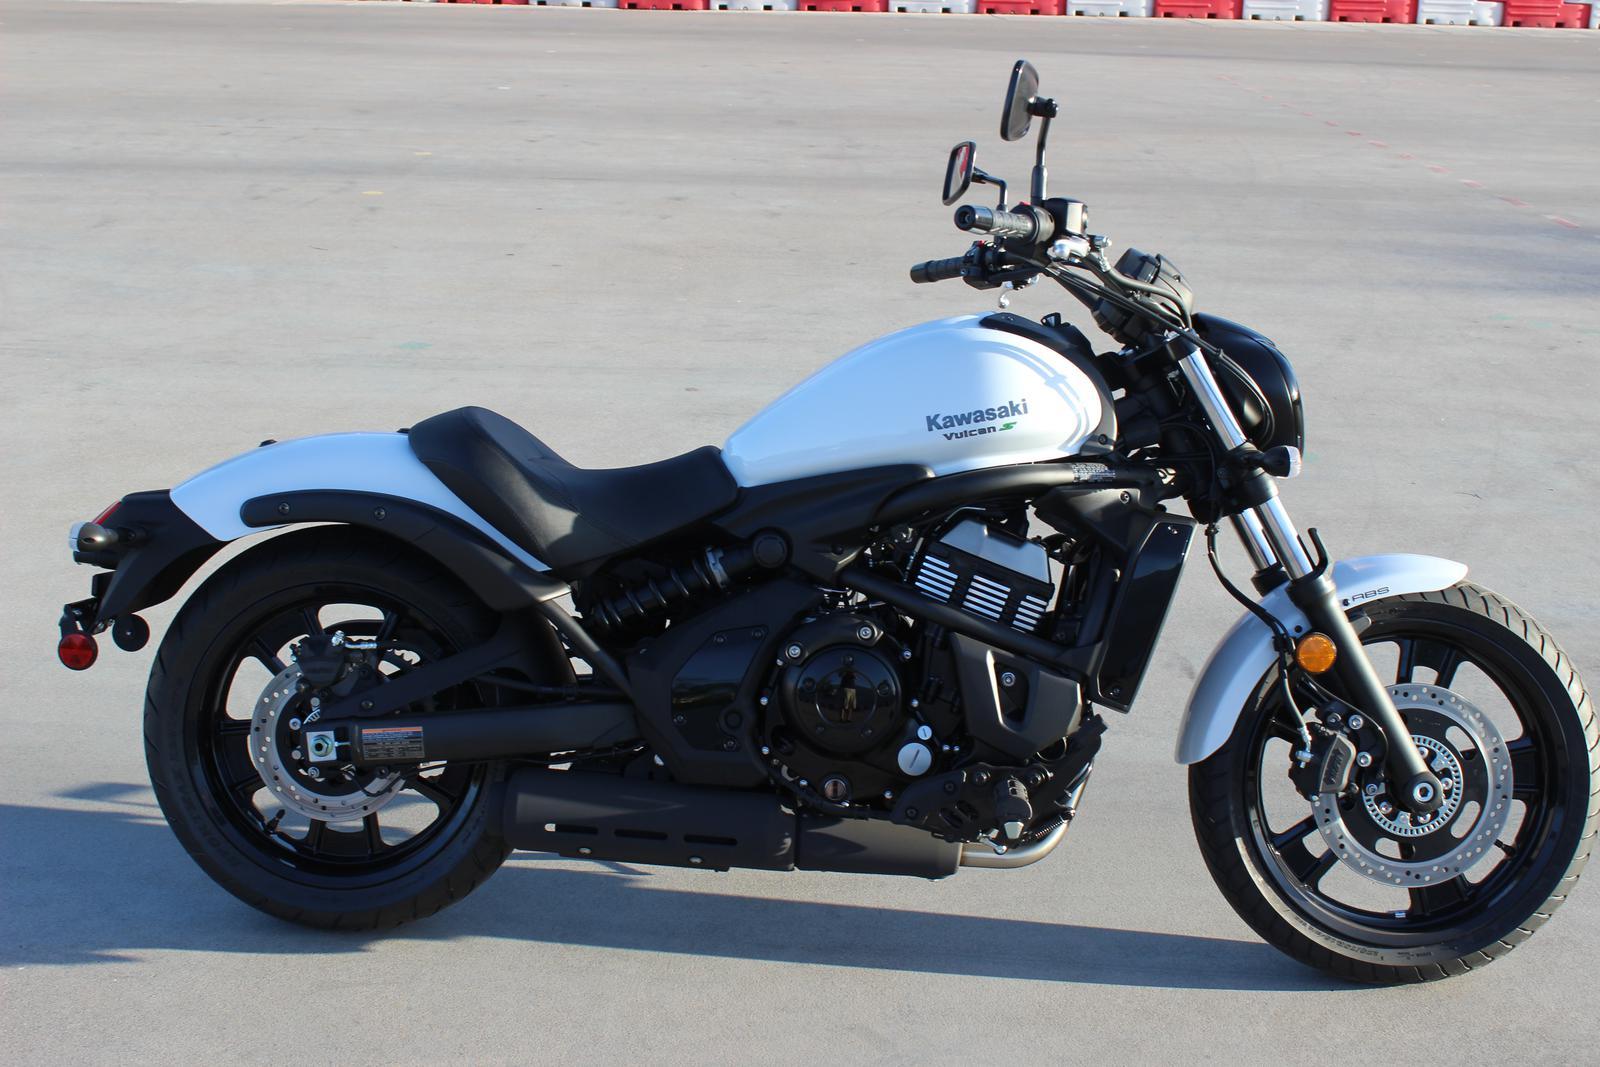 2018 Kawasaki Vulcan S Abs Go Az Motorcycles In Scottsdale